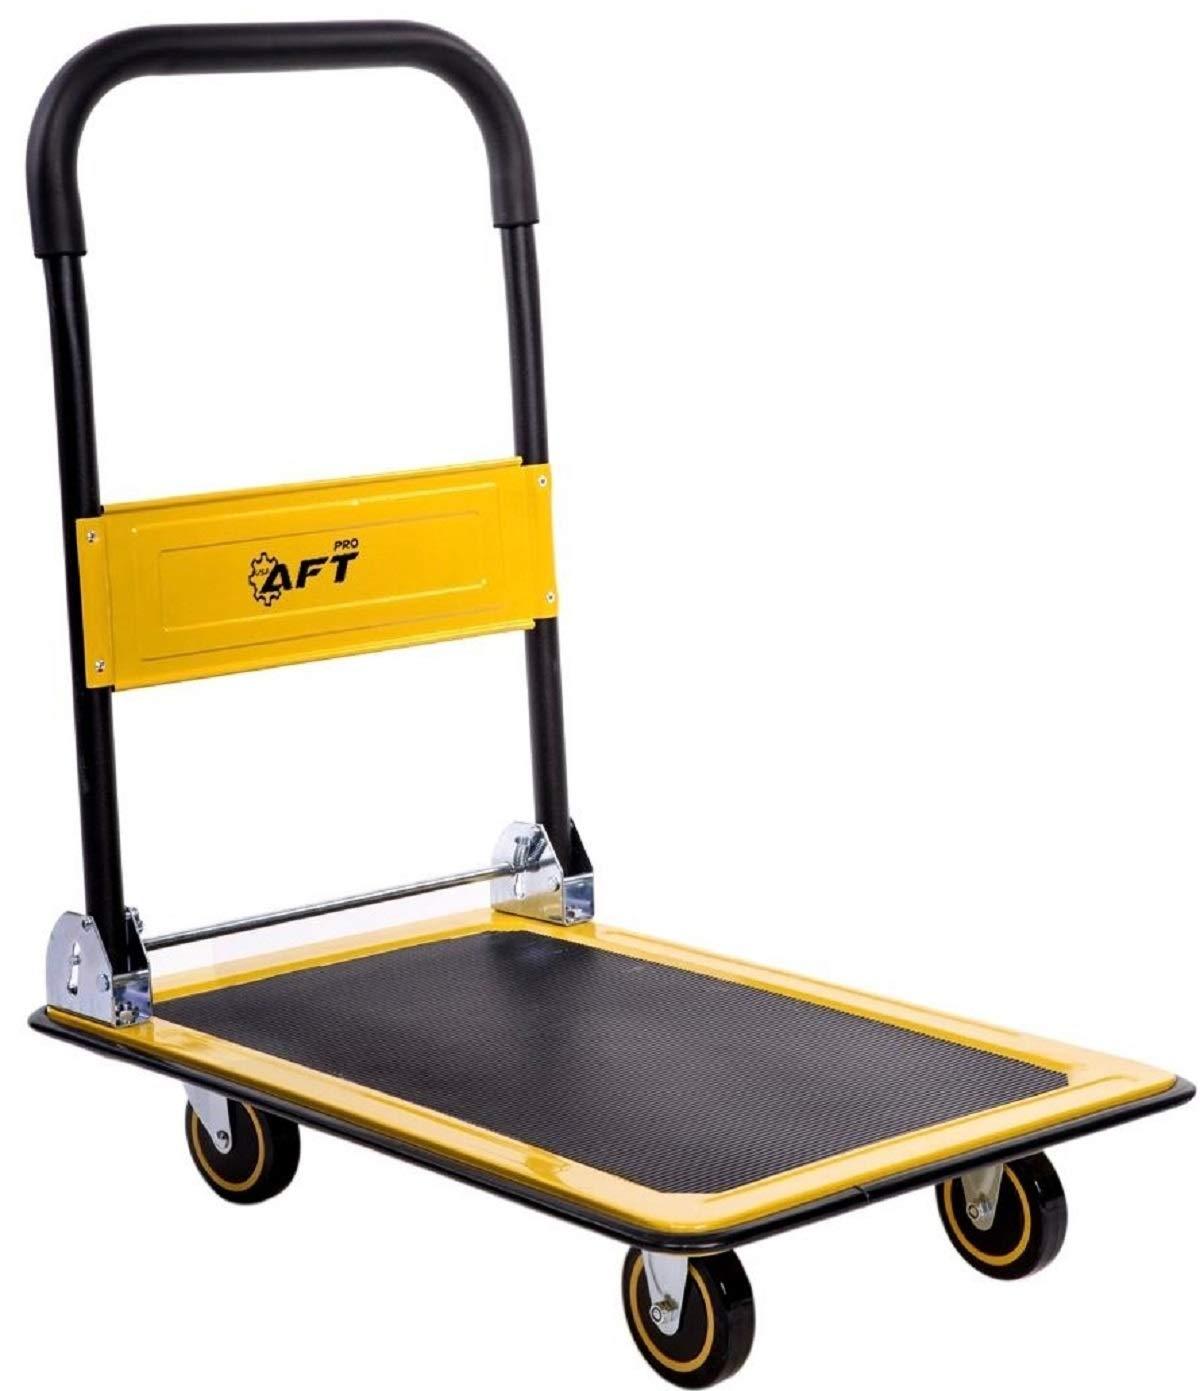 Push Platform Truck Dolly Aft Pro Usa Folding Rolling Flatbed Cart 330lb Weight Capacity 360 Degree Swivel Wheels Foldable Handle Yellow 330lb Home Improvement